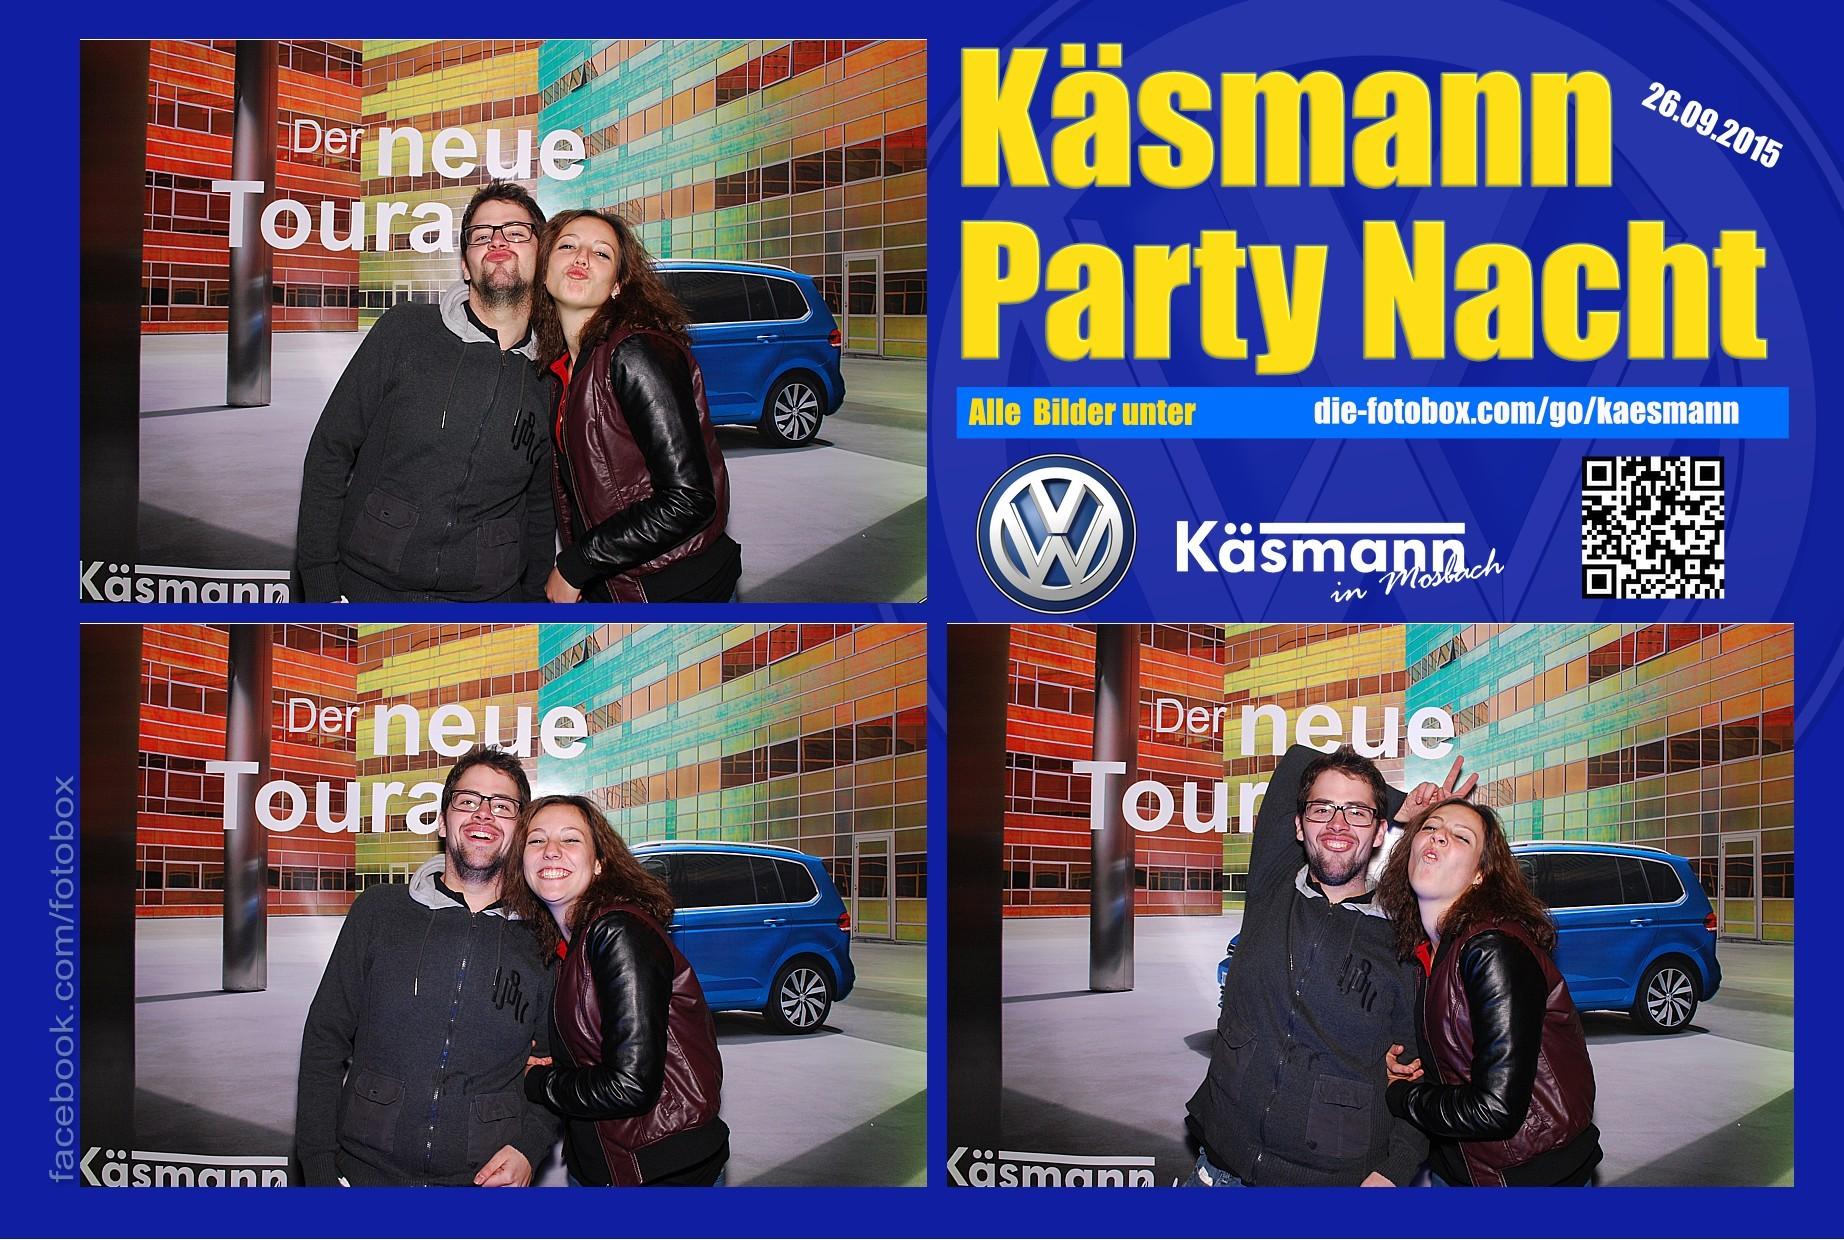 Käsmannparty 2015 - www.die-fotobox.com 01348